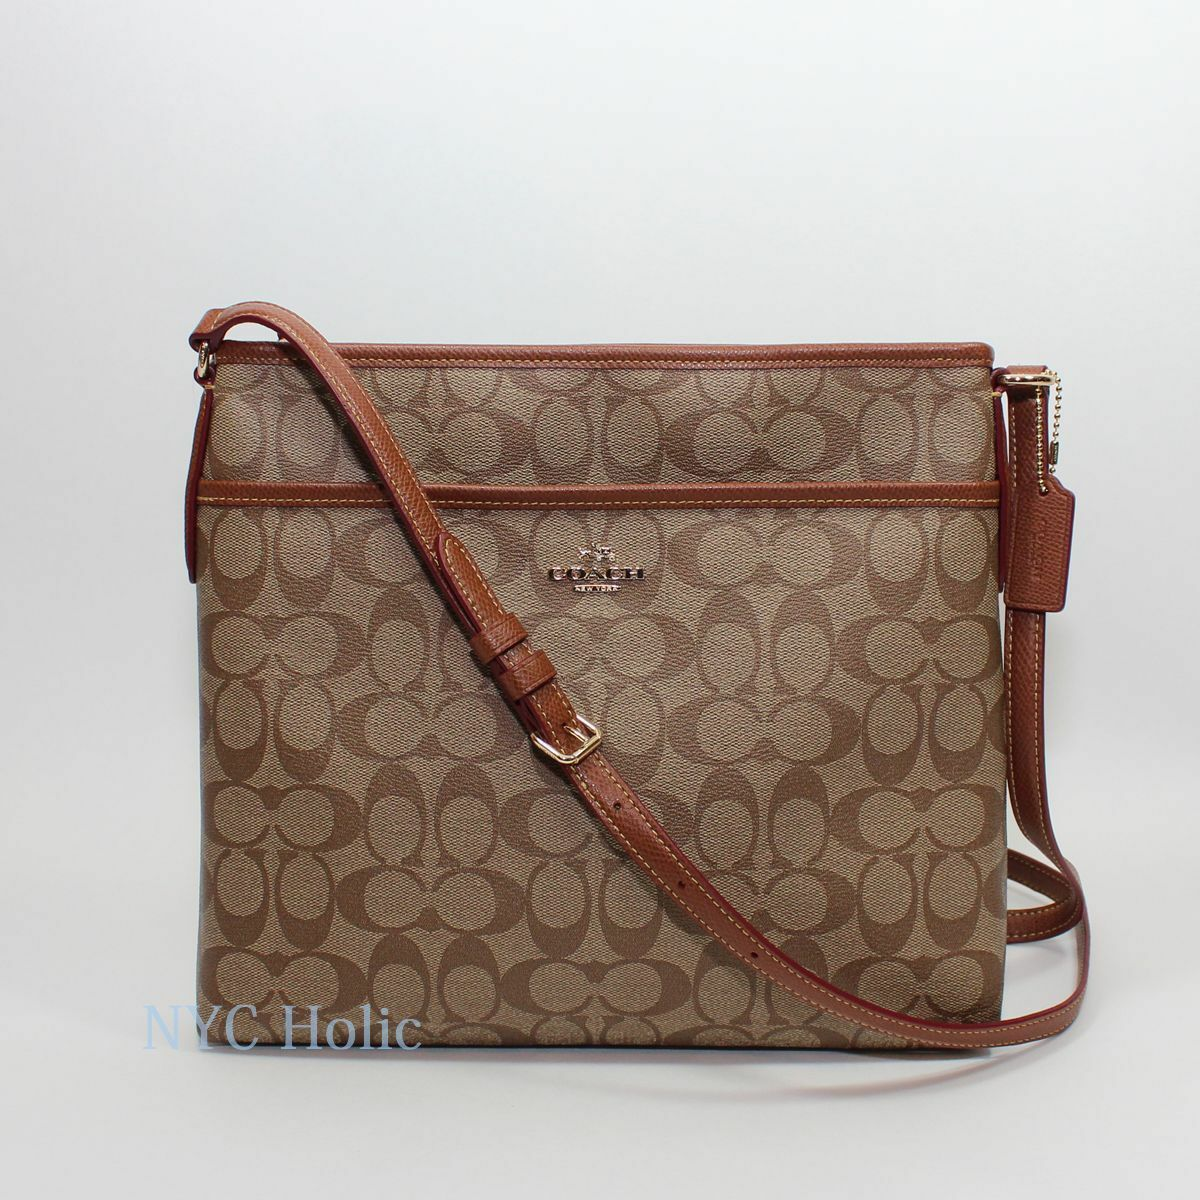 New COACH F34938 Signature File Bag Crossbody Handbag ...